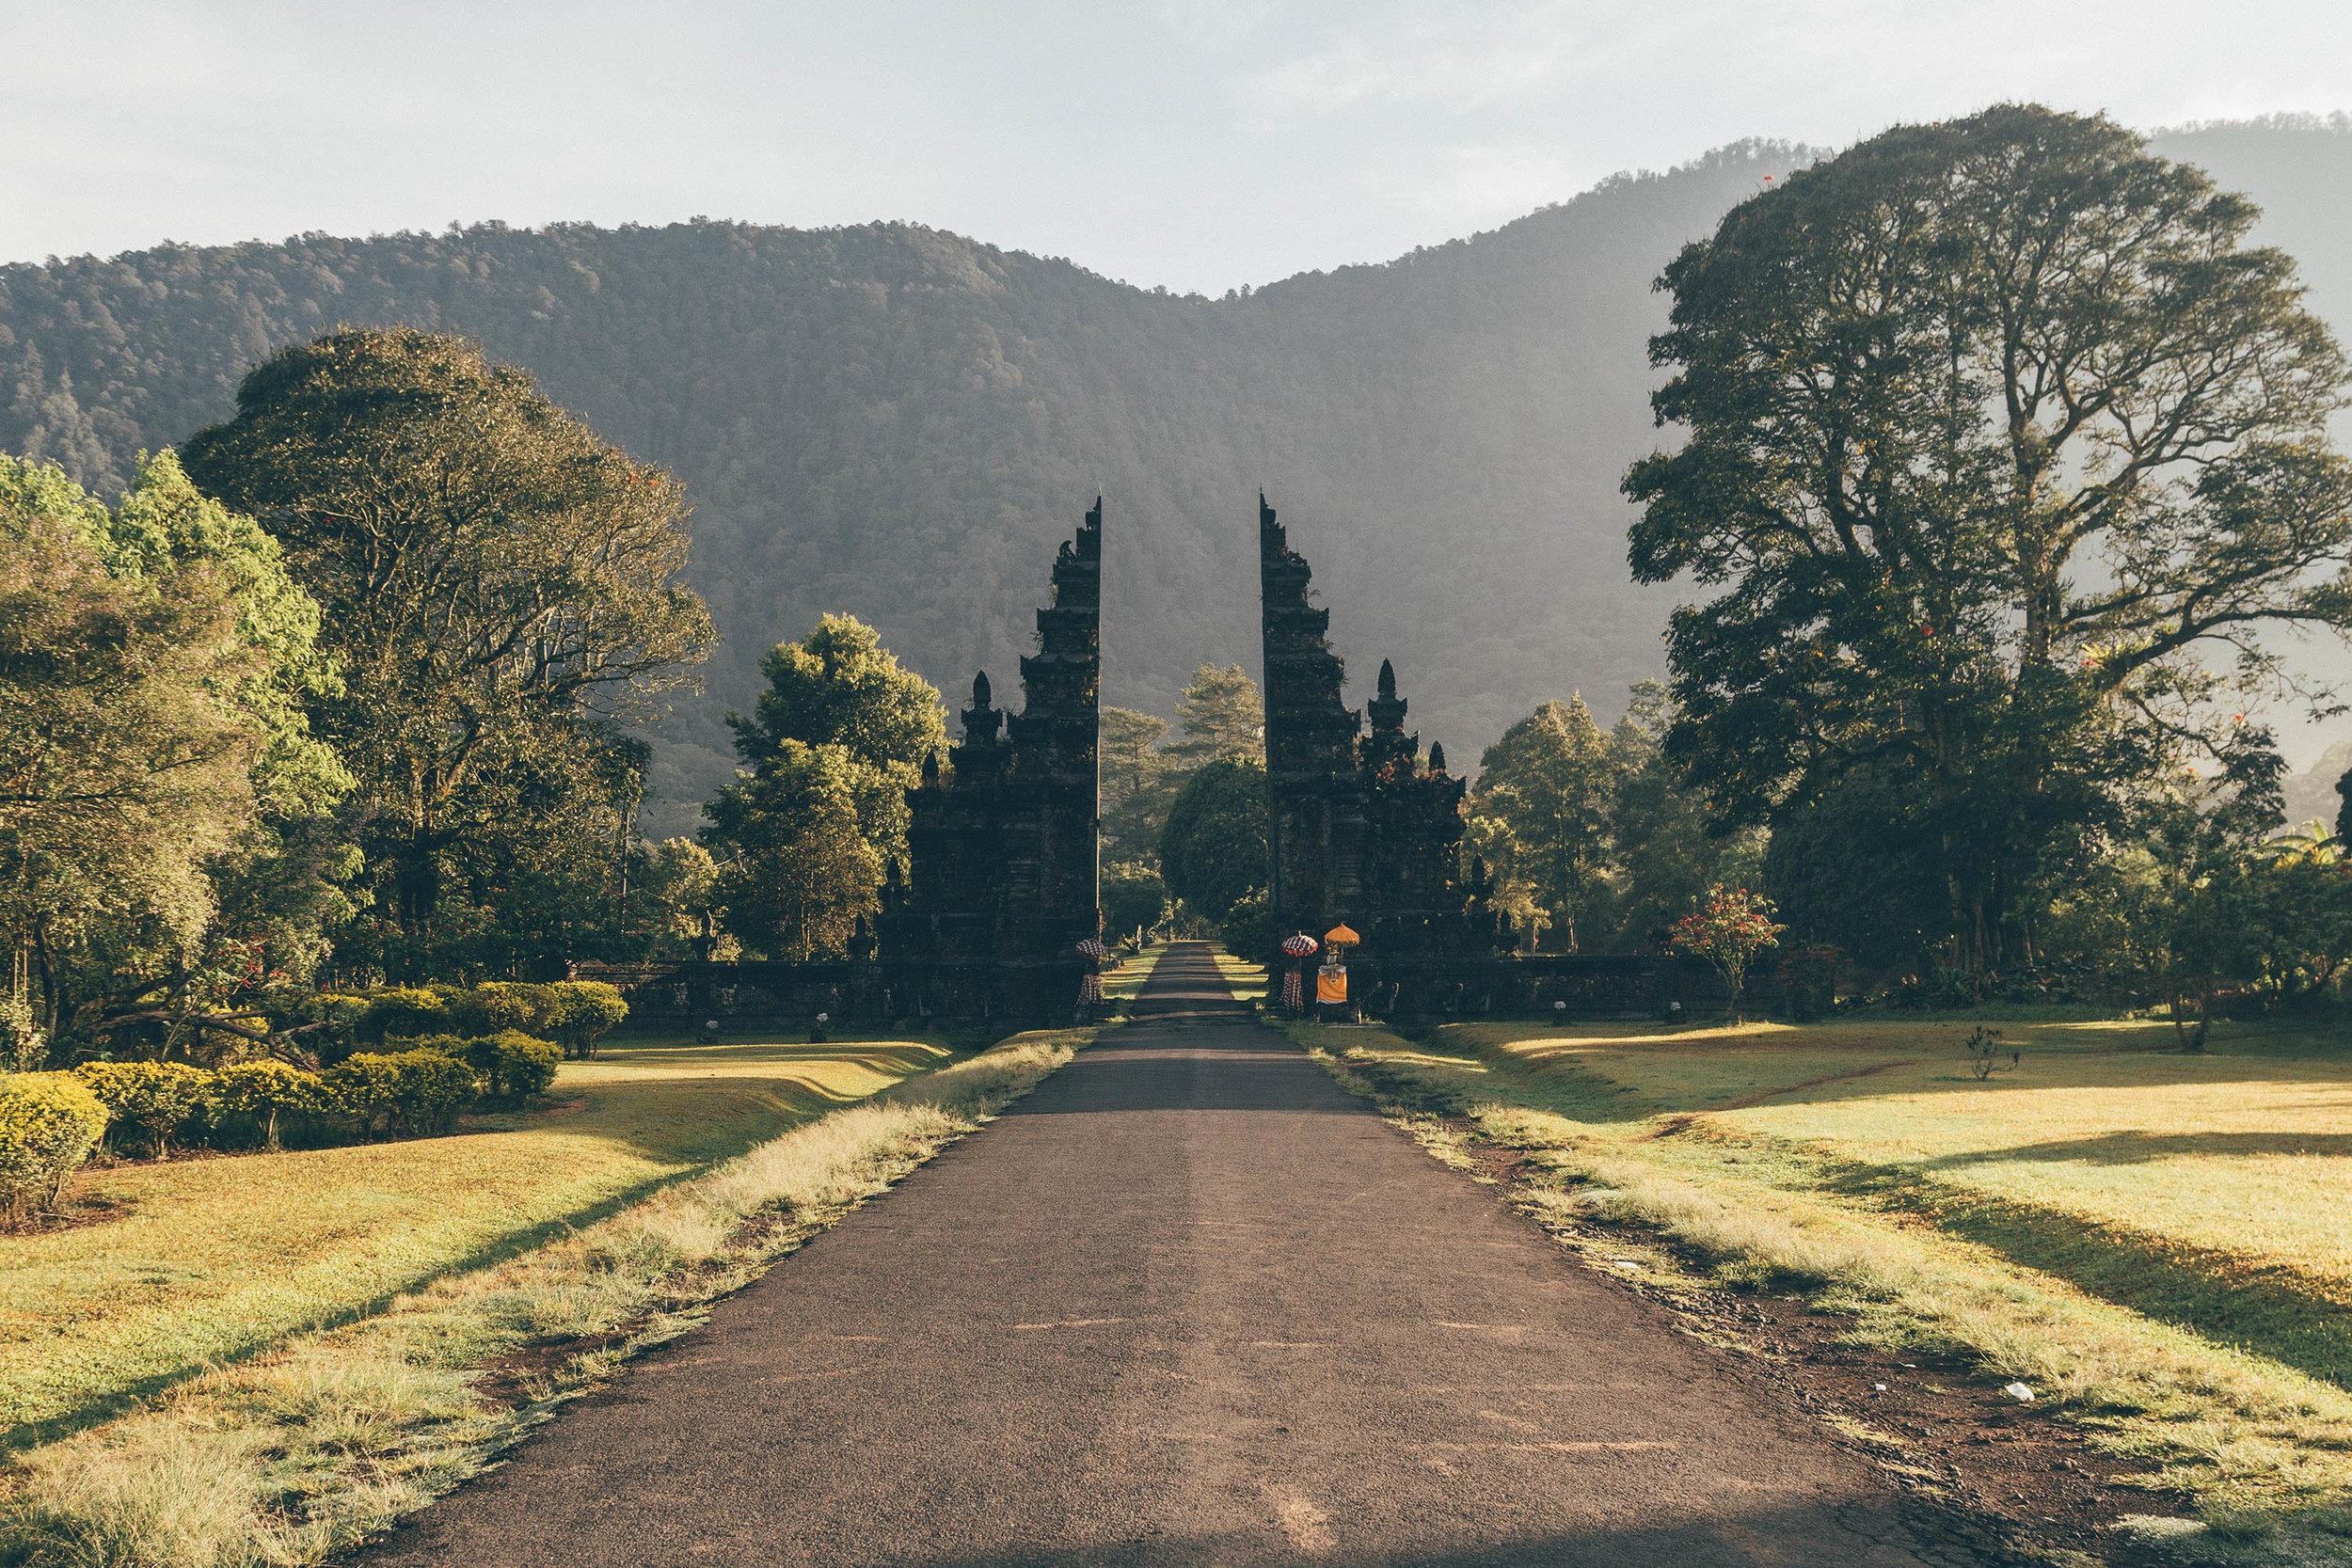 beat places to go bali munduk gates photos beautiful travel couple asia